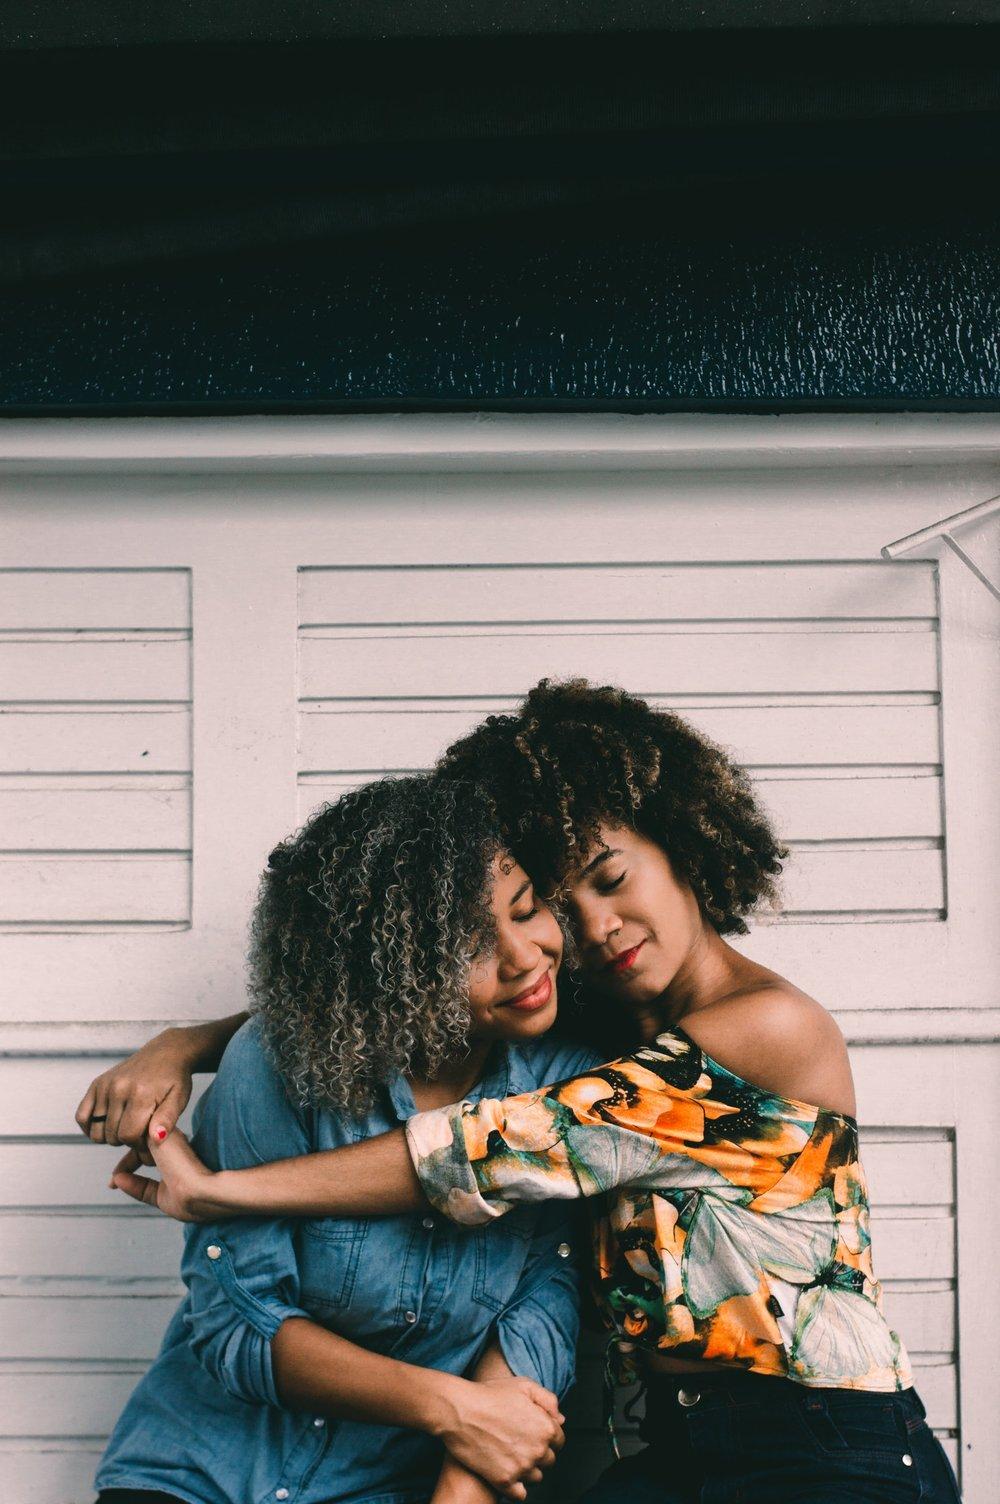 black_women_photo-1522621032211-ac0031dfbddc.jpg